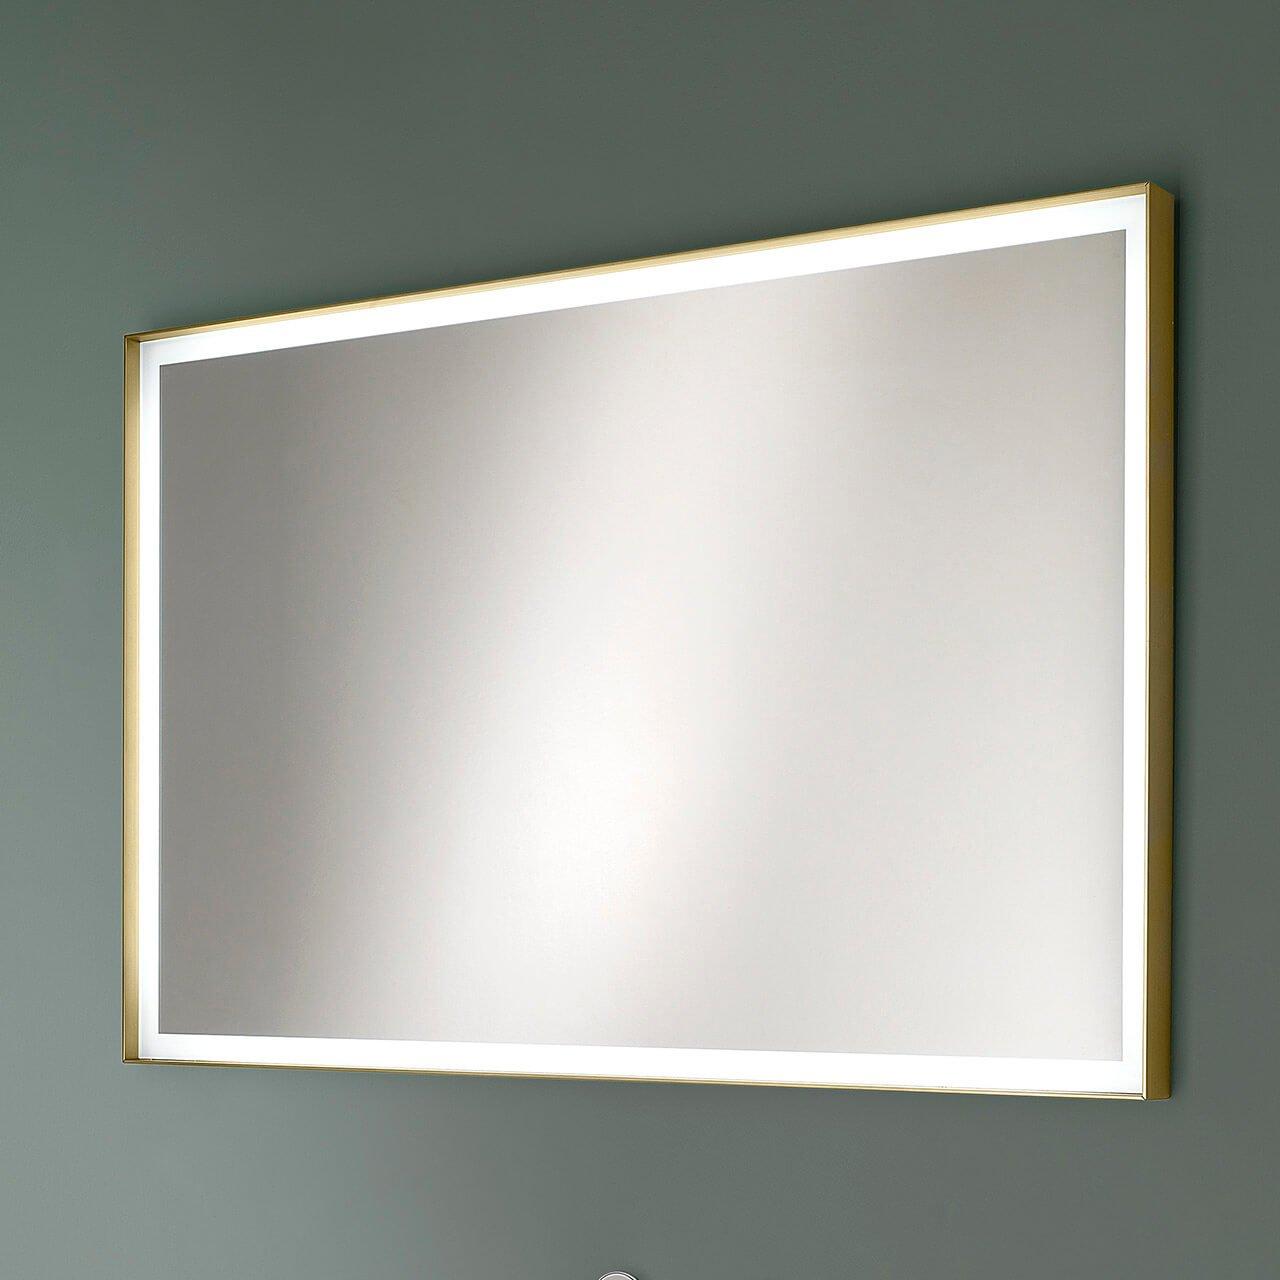 specchio charme bronzo